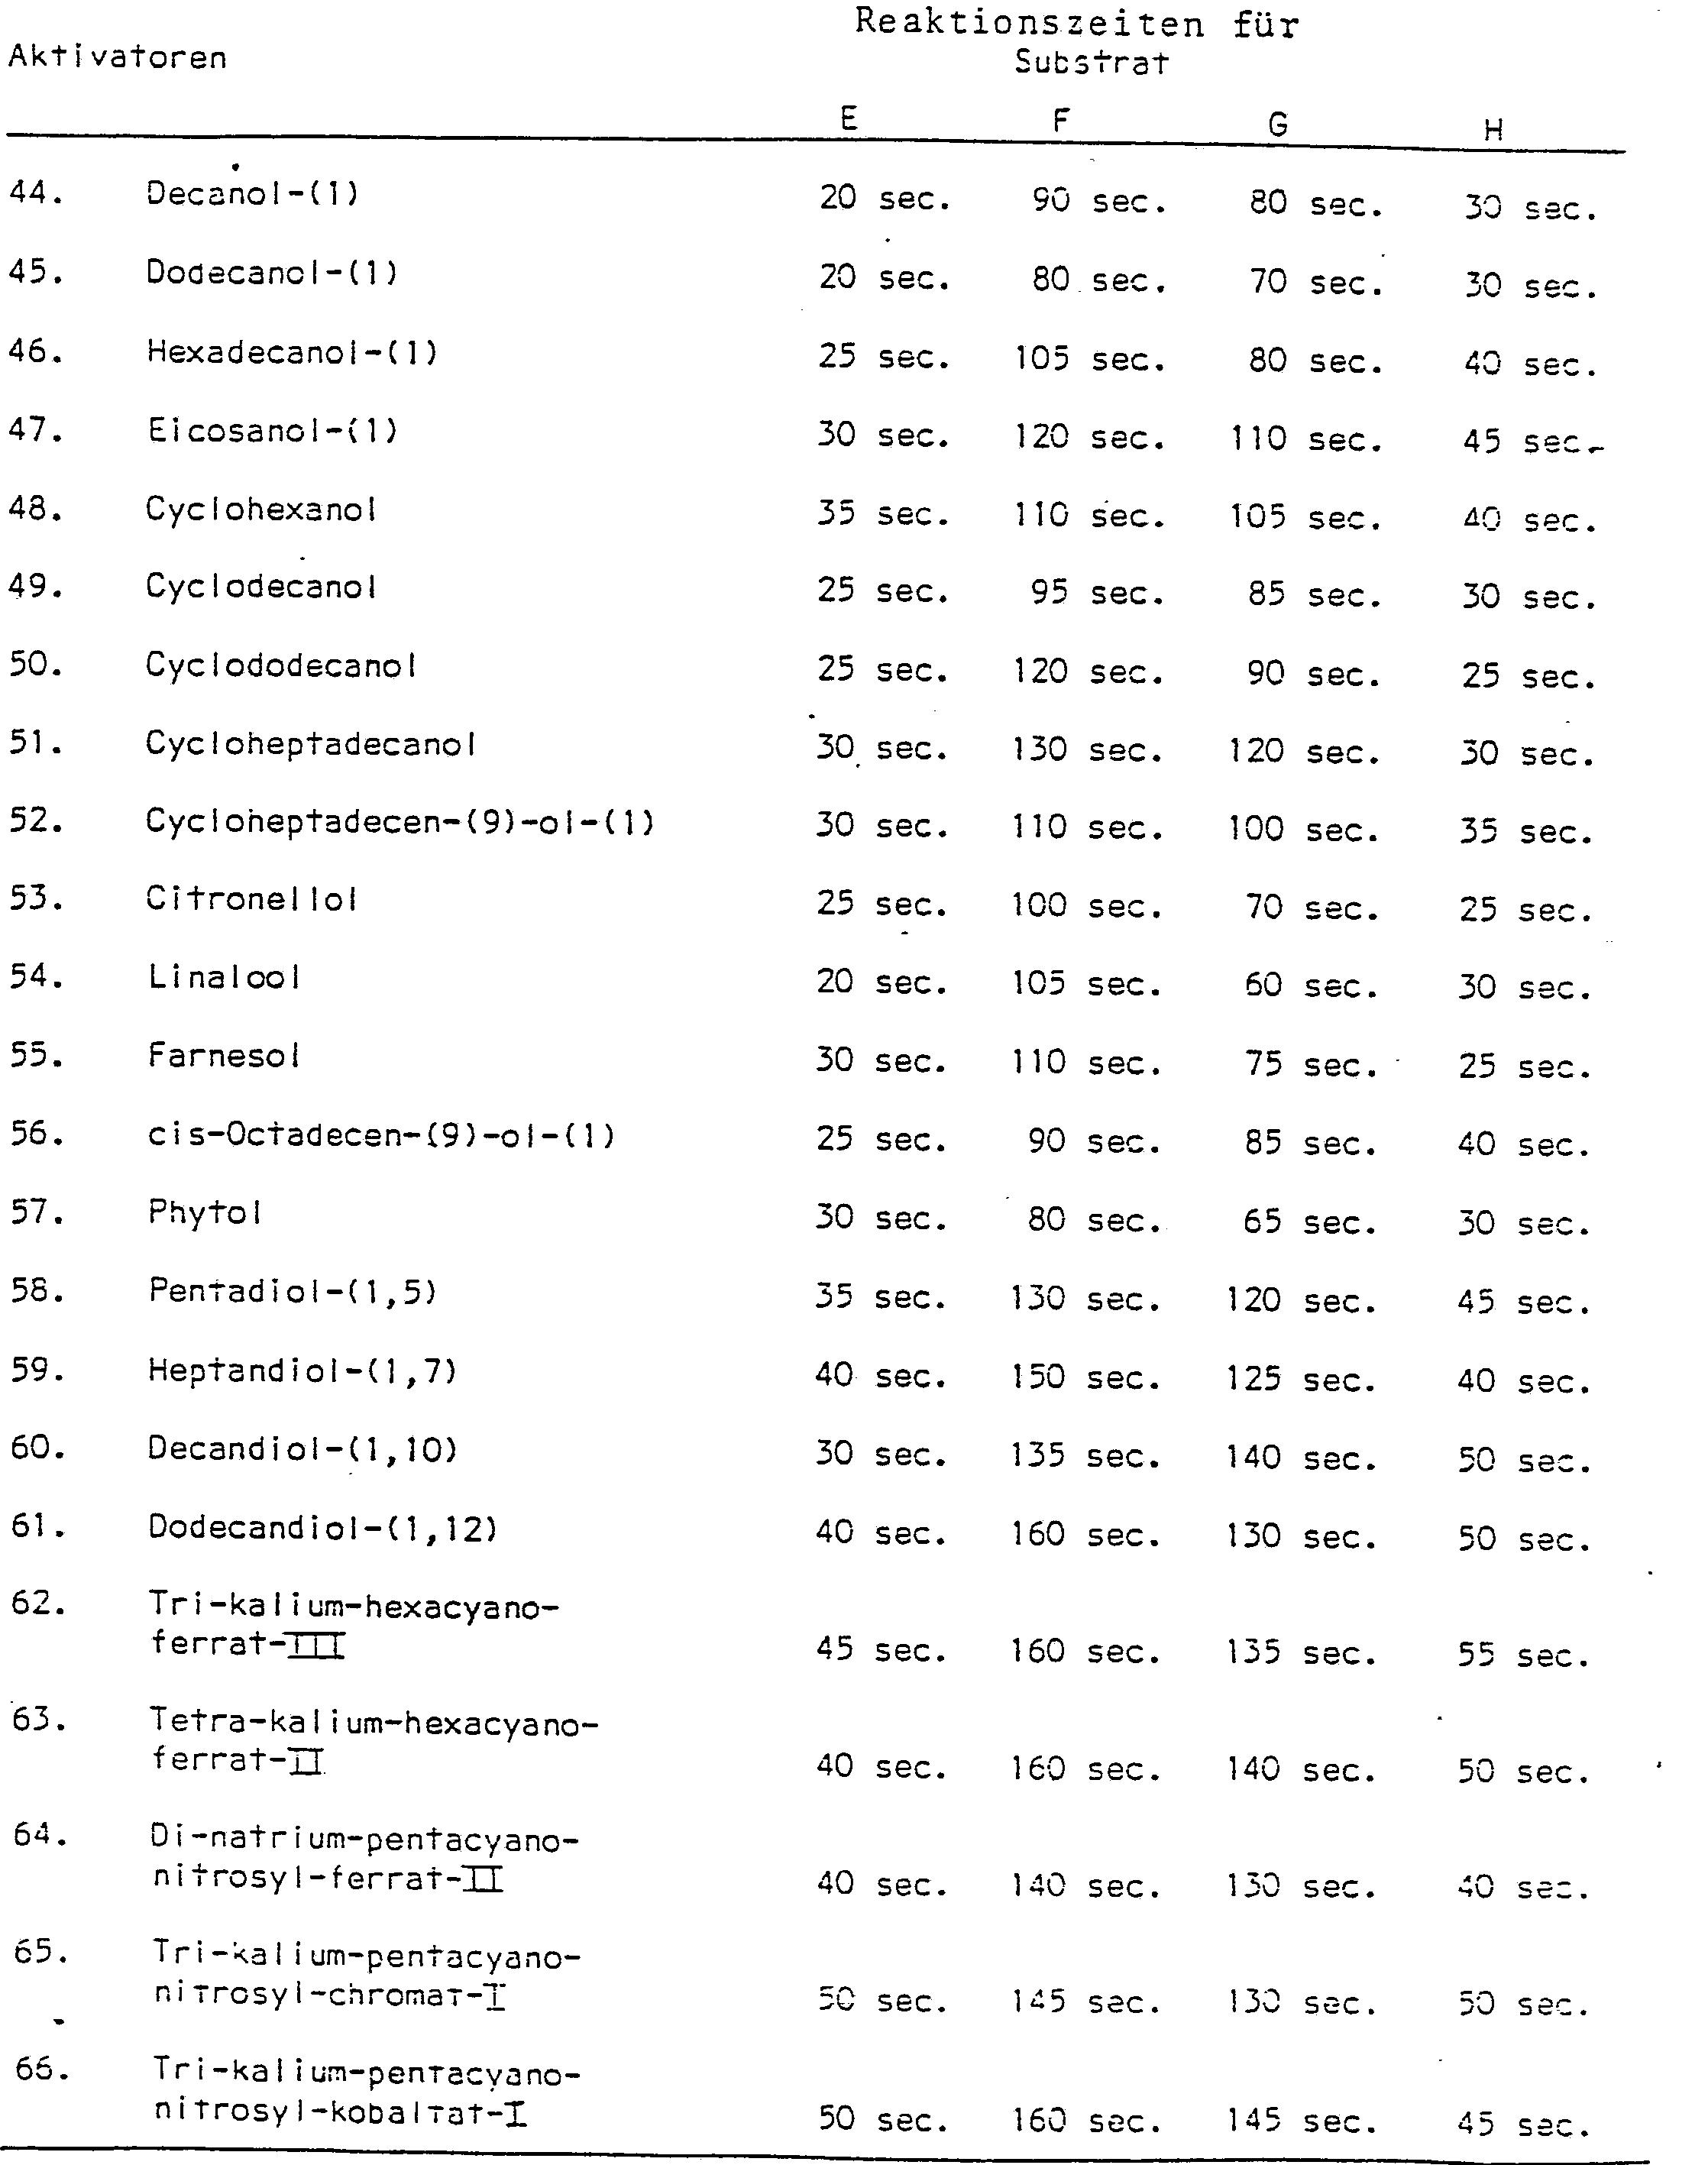 Sodium preparation tetraborat - an effective remedy against candidiasis 69